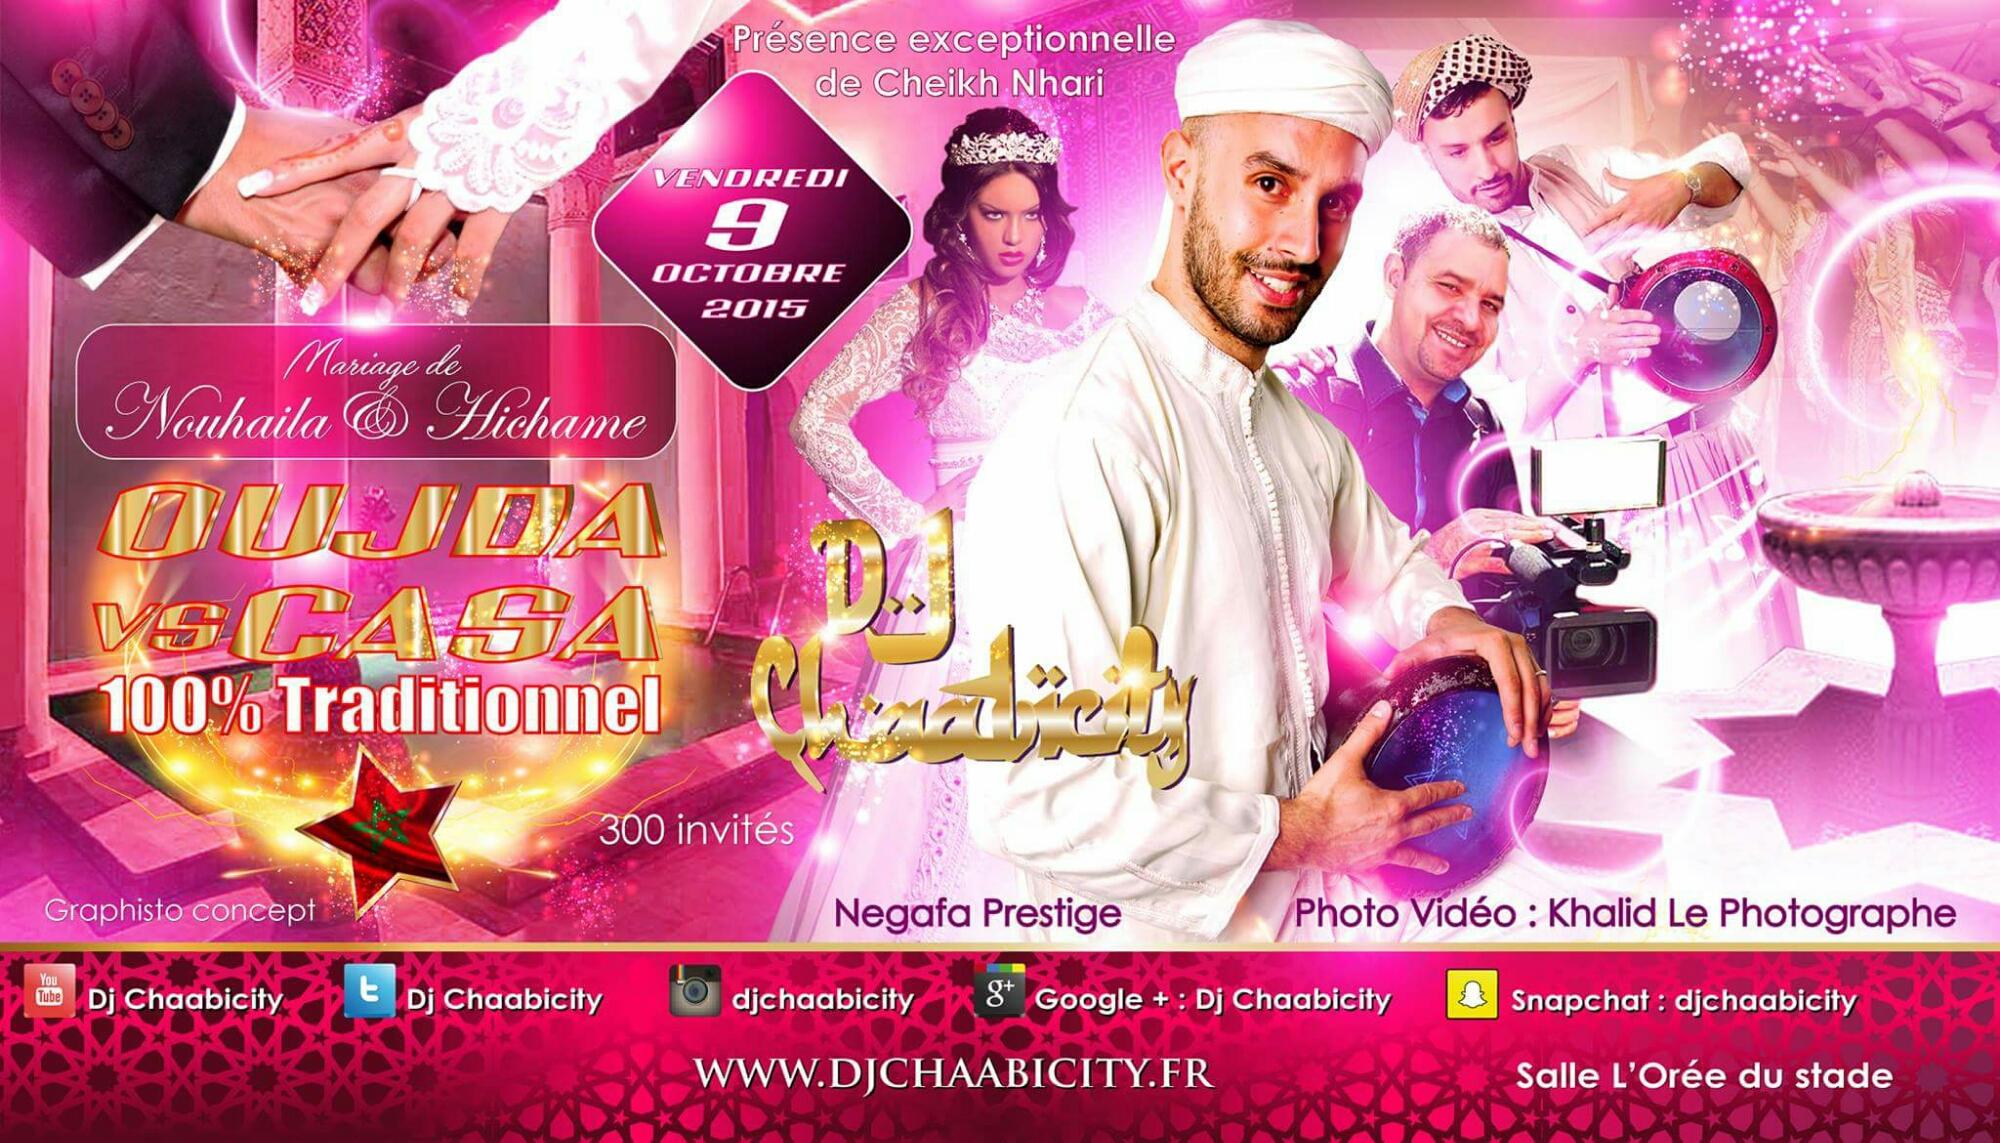 Mariage 100 marocain oujda vs casa dj oriental paris - Salon du mariage oriental 2015 paris ...